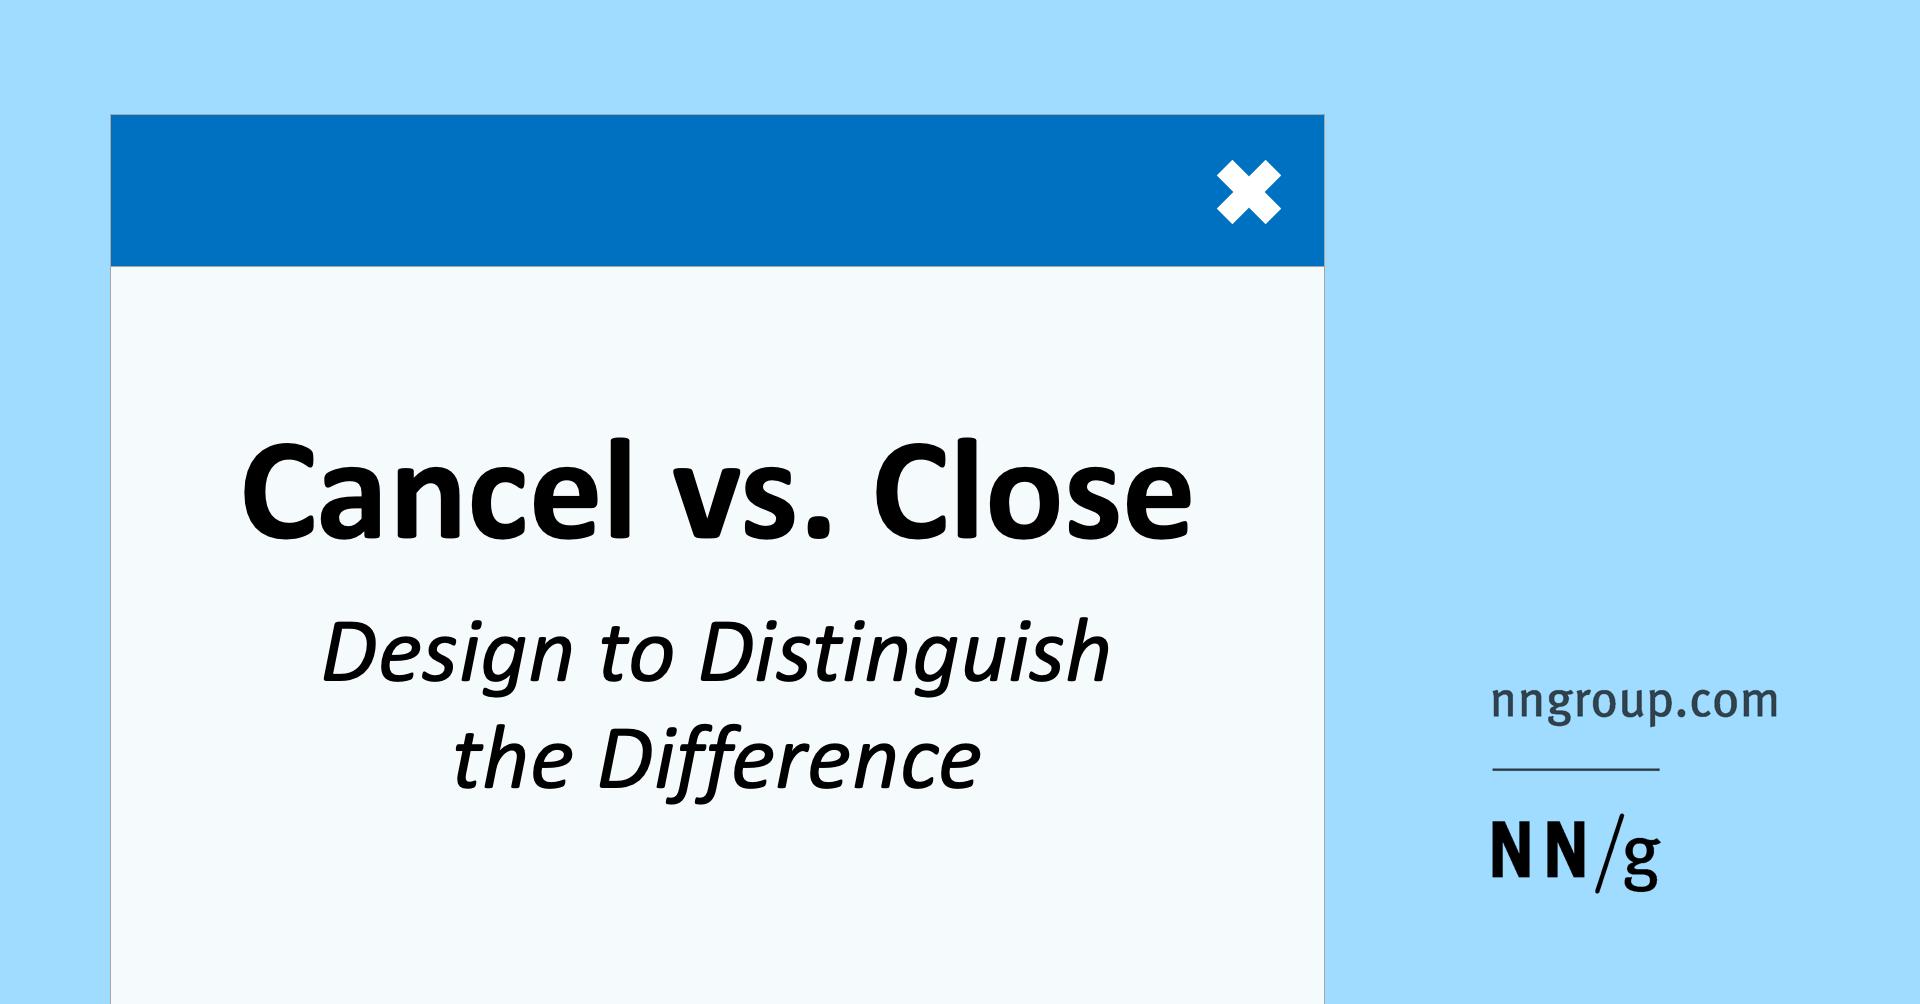 Cancel vs Close: Design to Distinguish the Difference